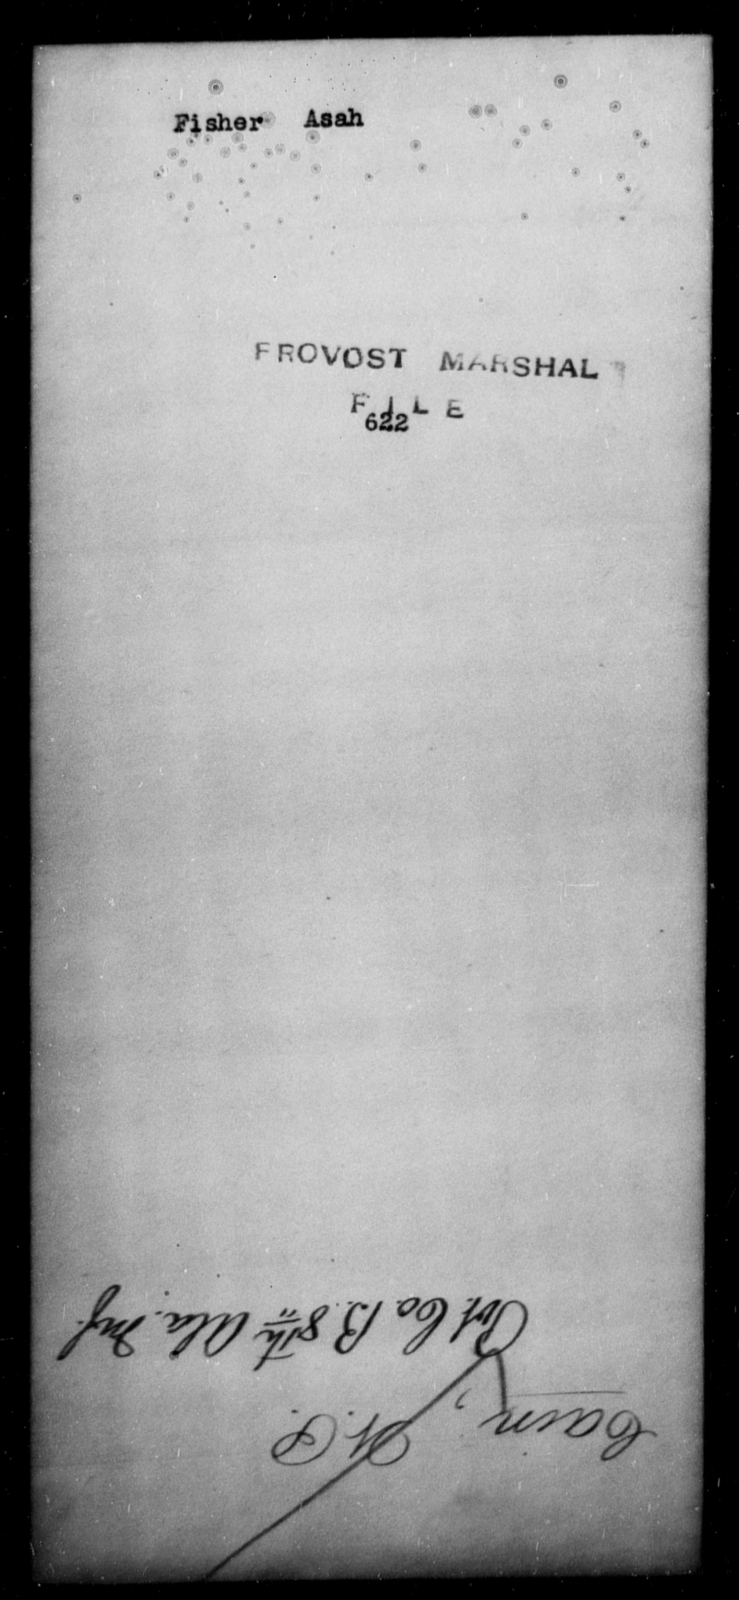 Fisher, Asah - State: [Blank] - Year: [Blank]